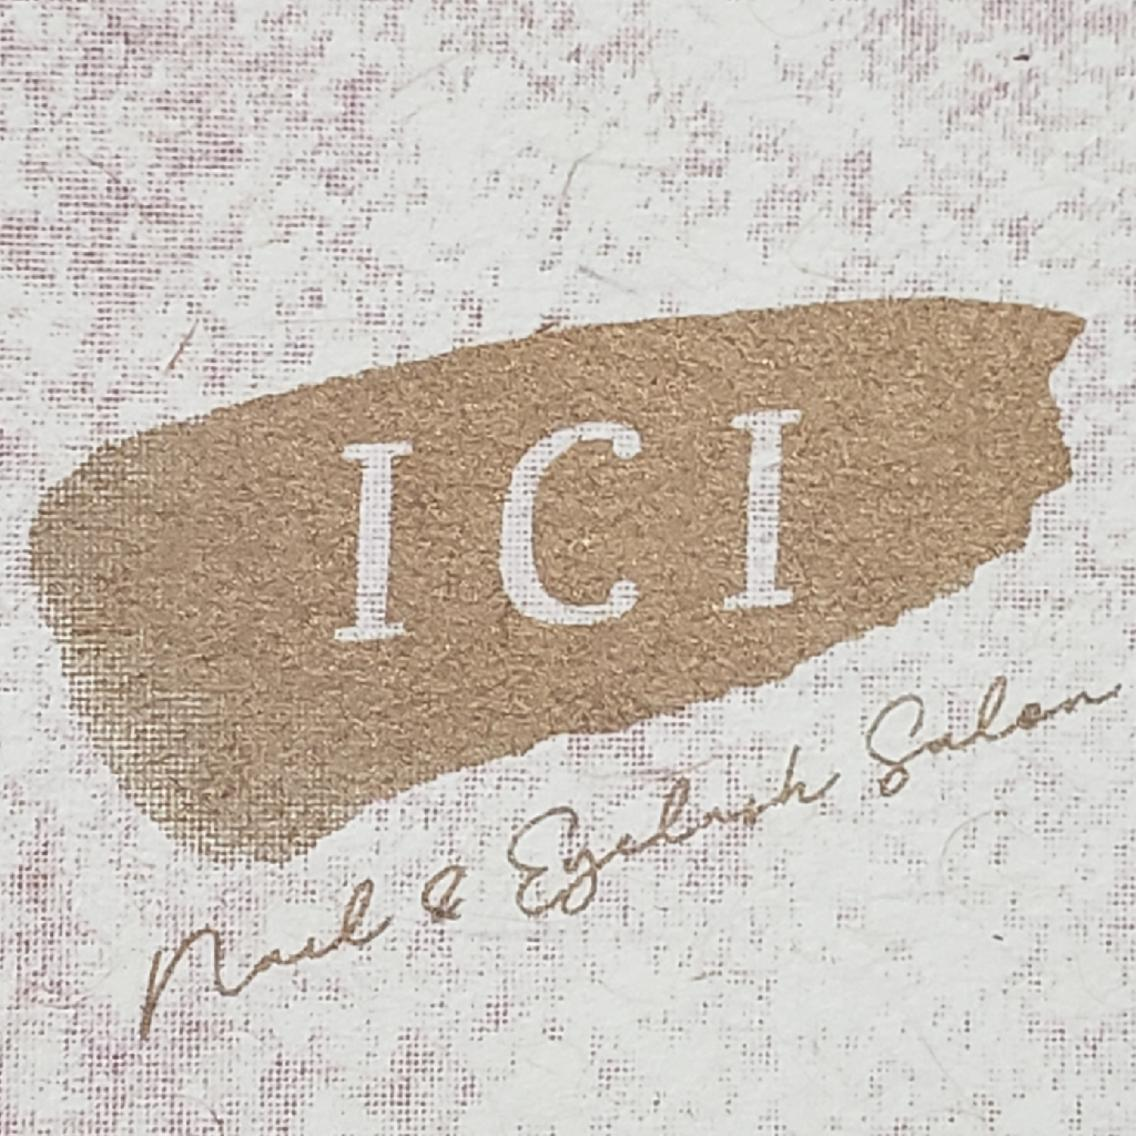 ICI -Atelier coco-所属・KOBAYASHIRISAの掲載